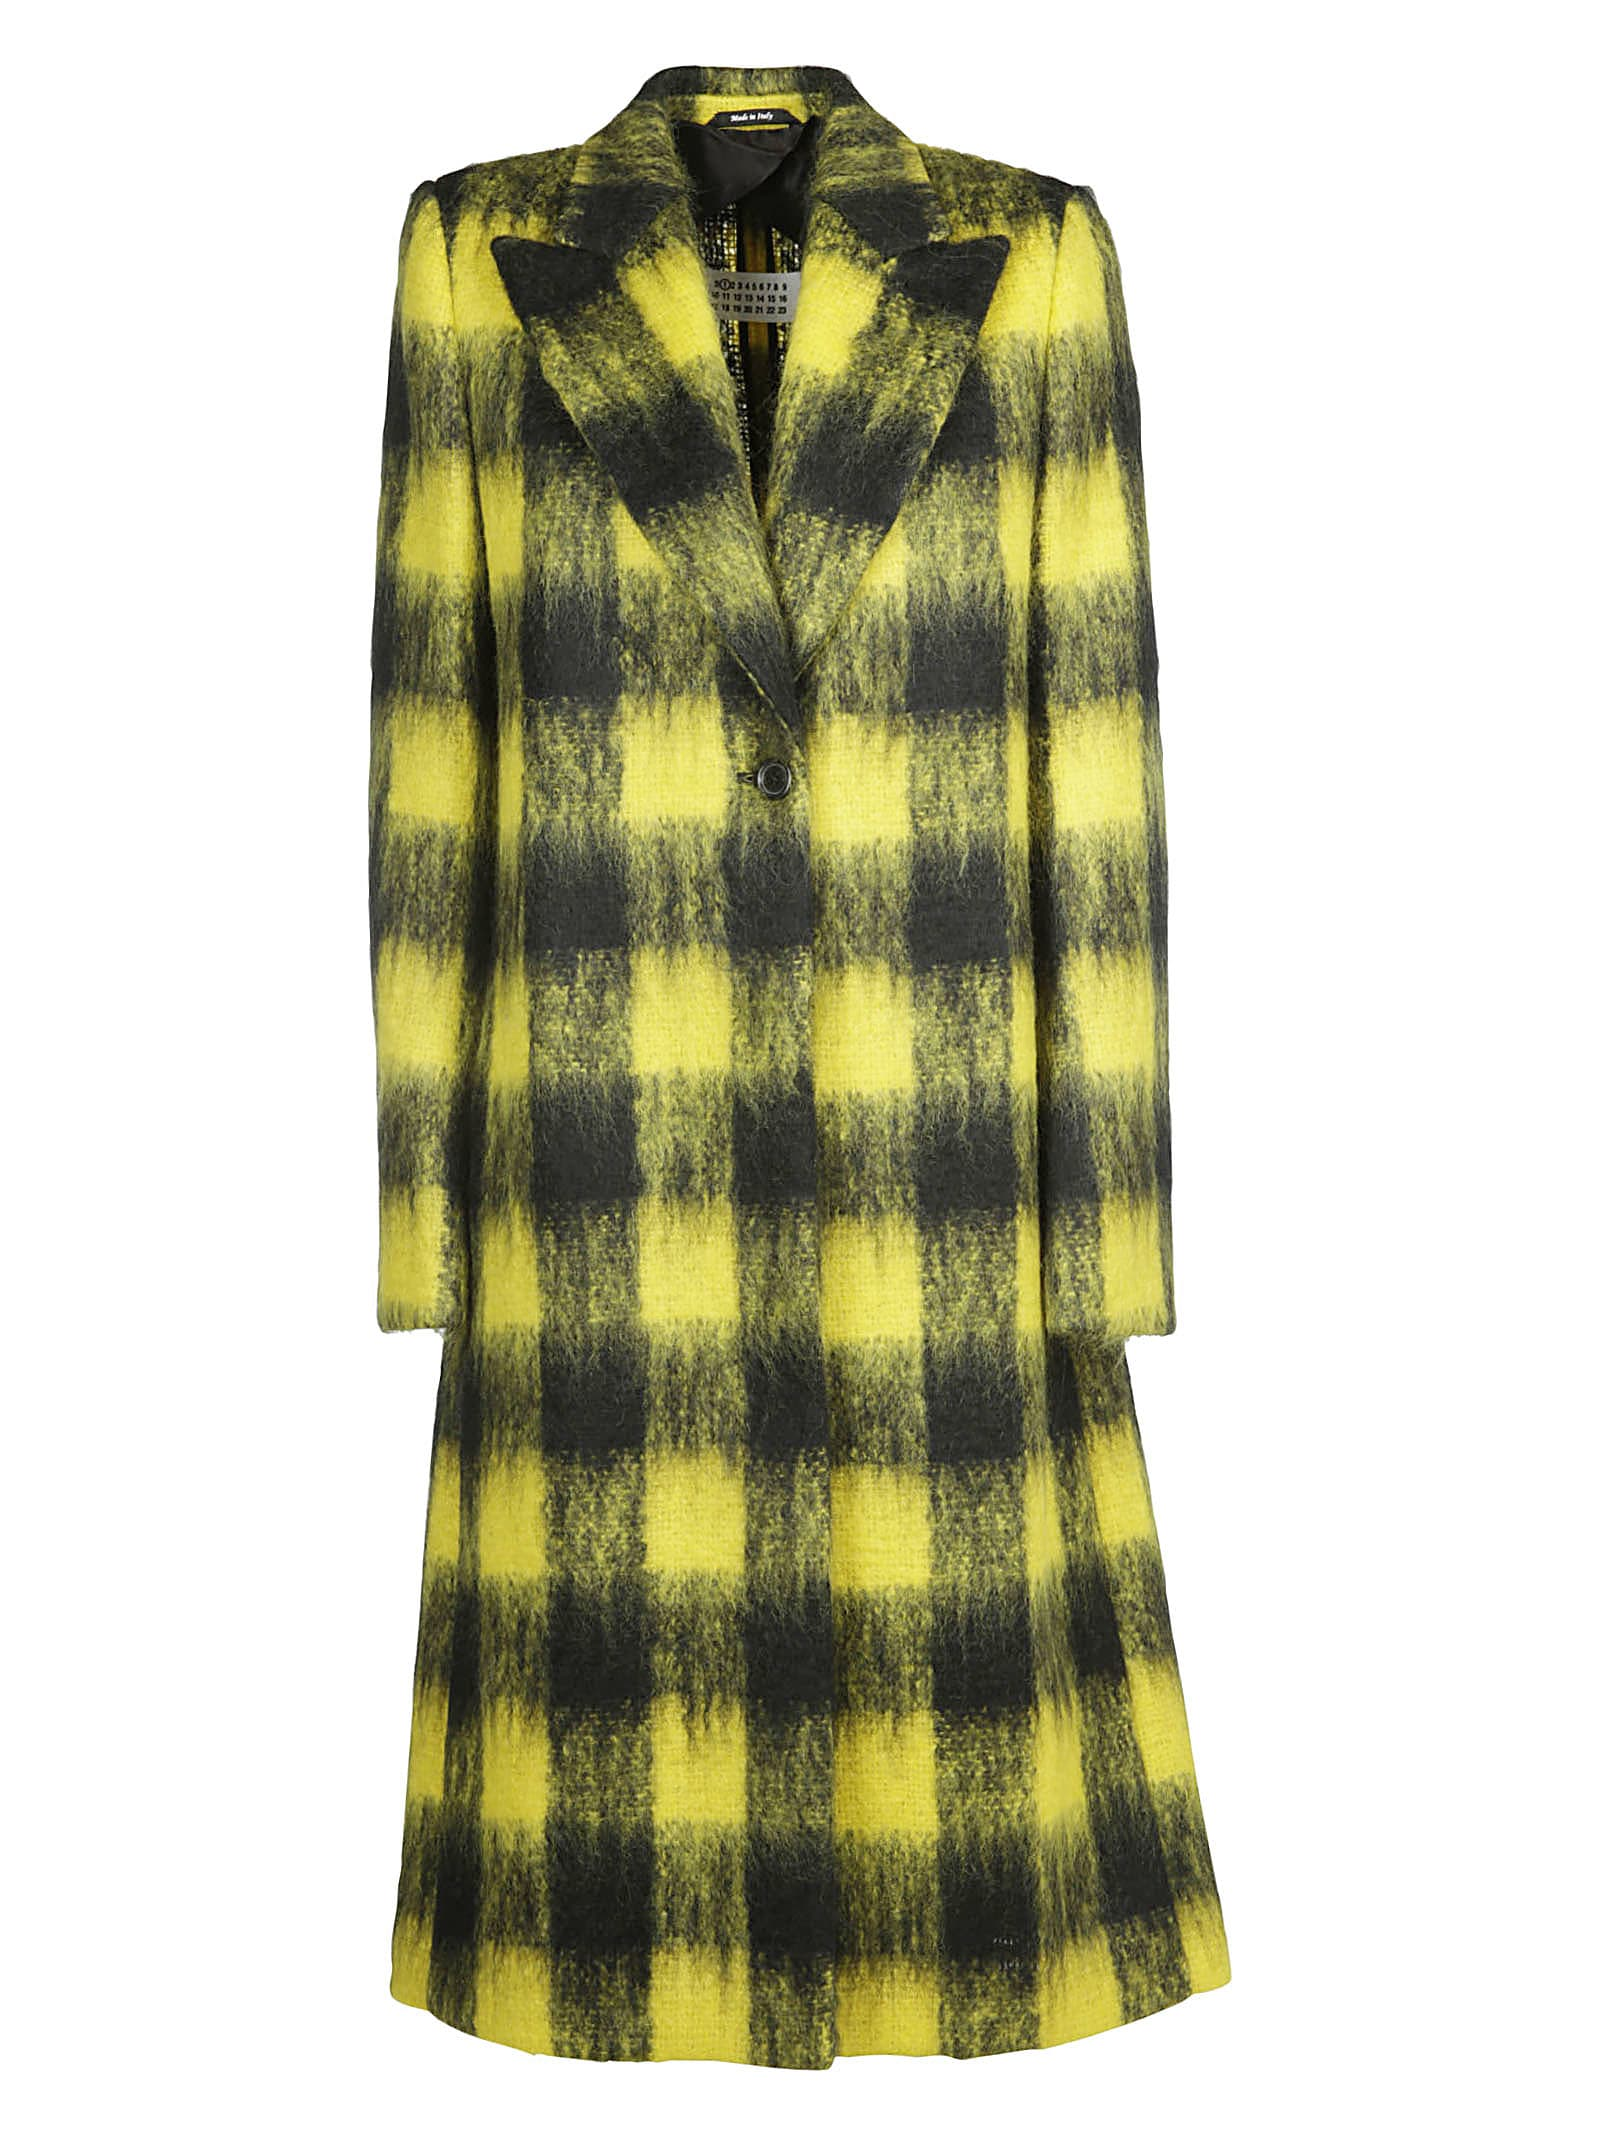 Photo of  Maison Margiela Cashmere Coat- shop Maison Margiela jackets online sales